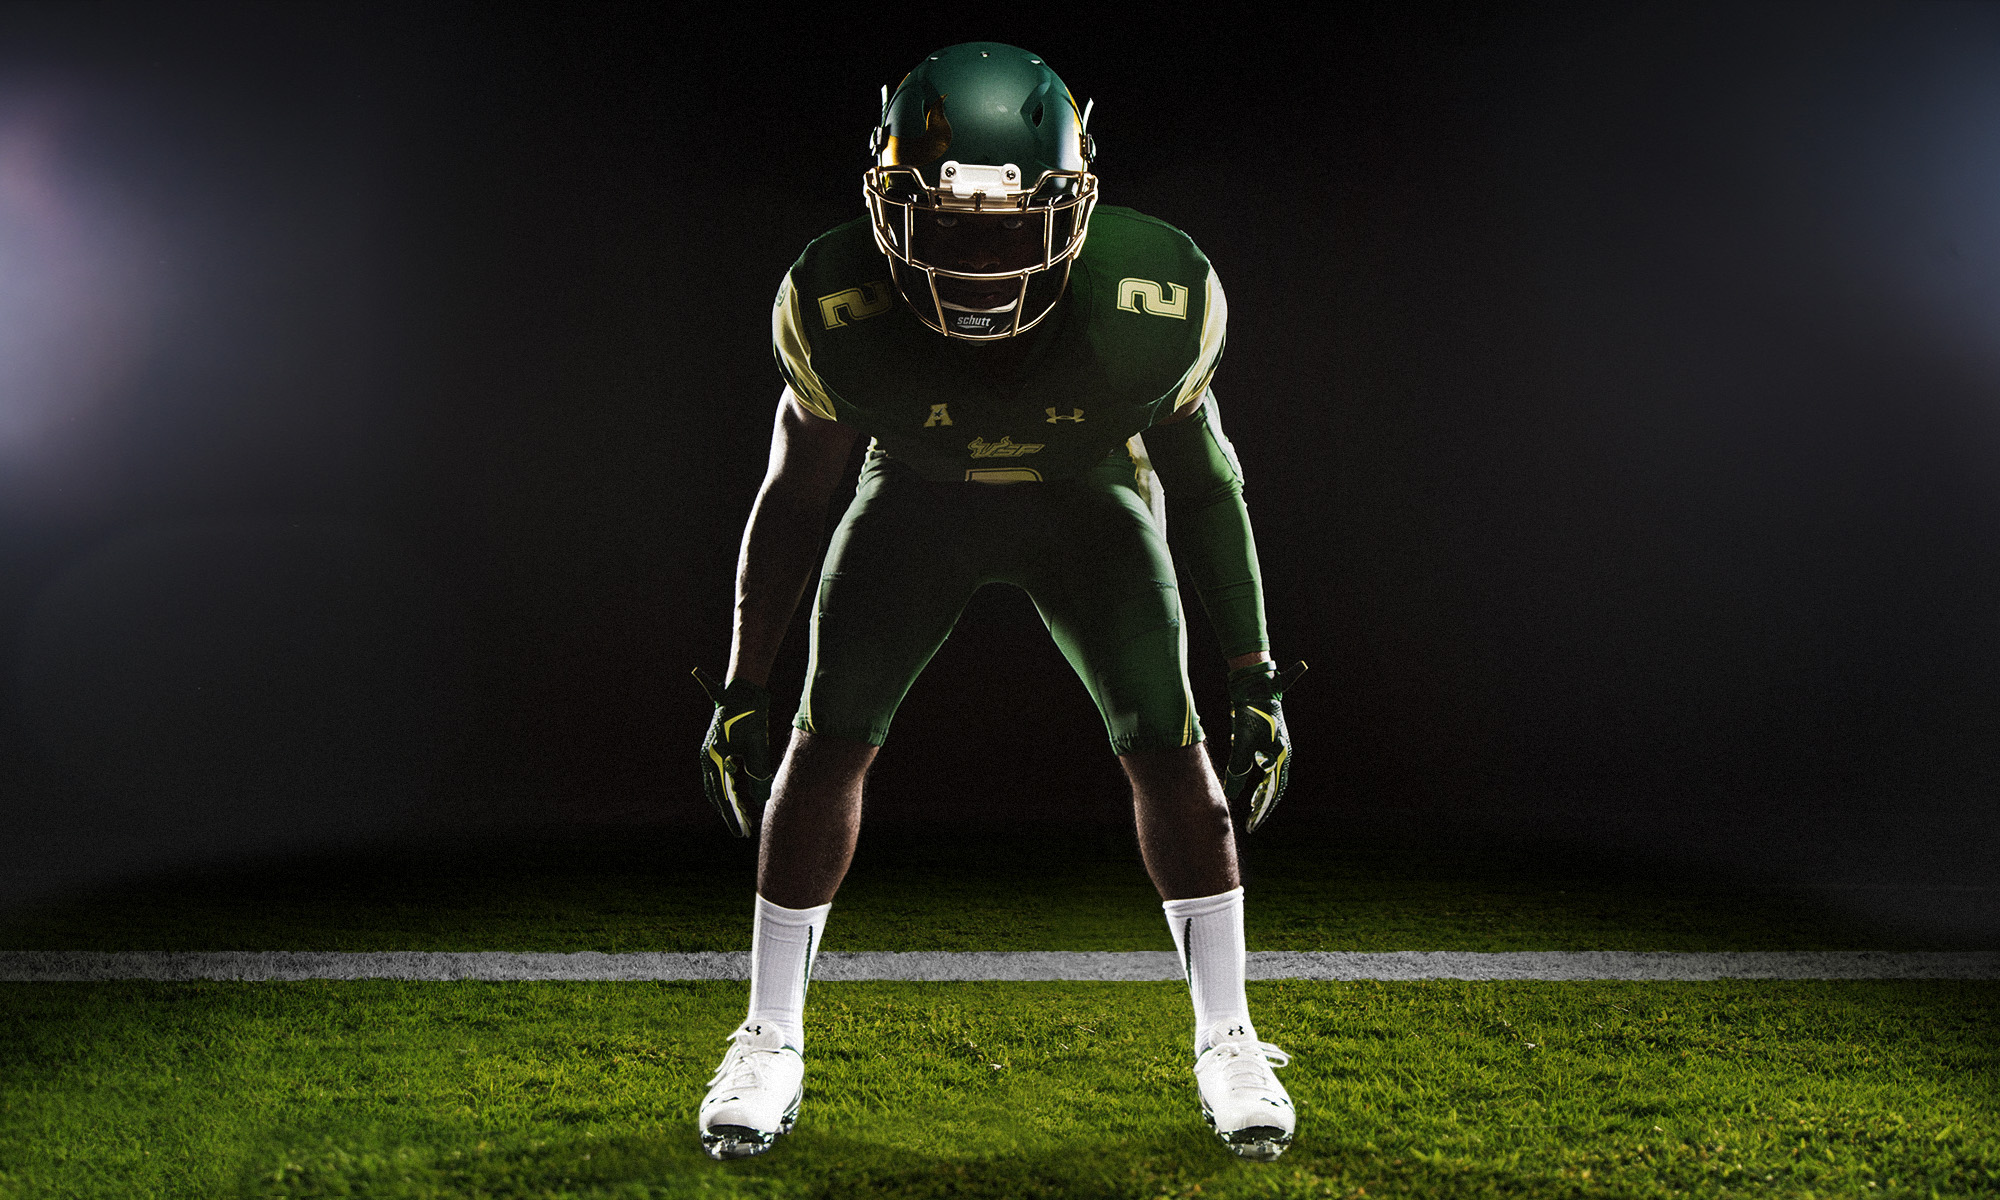 USF-Football-Green-126-grass